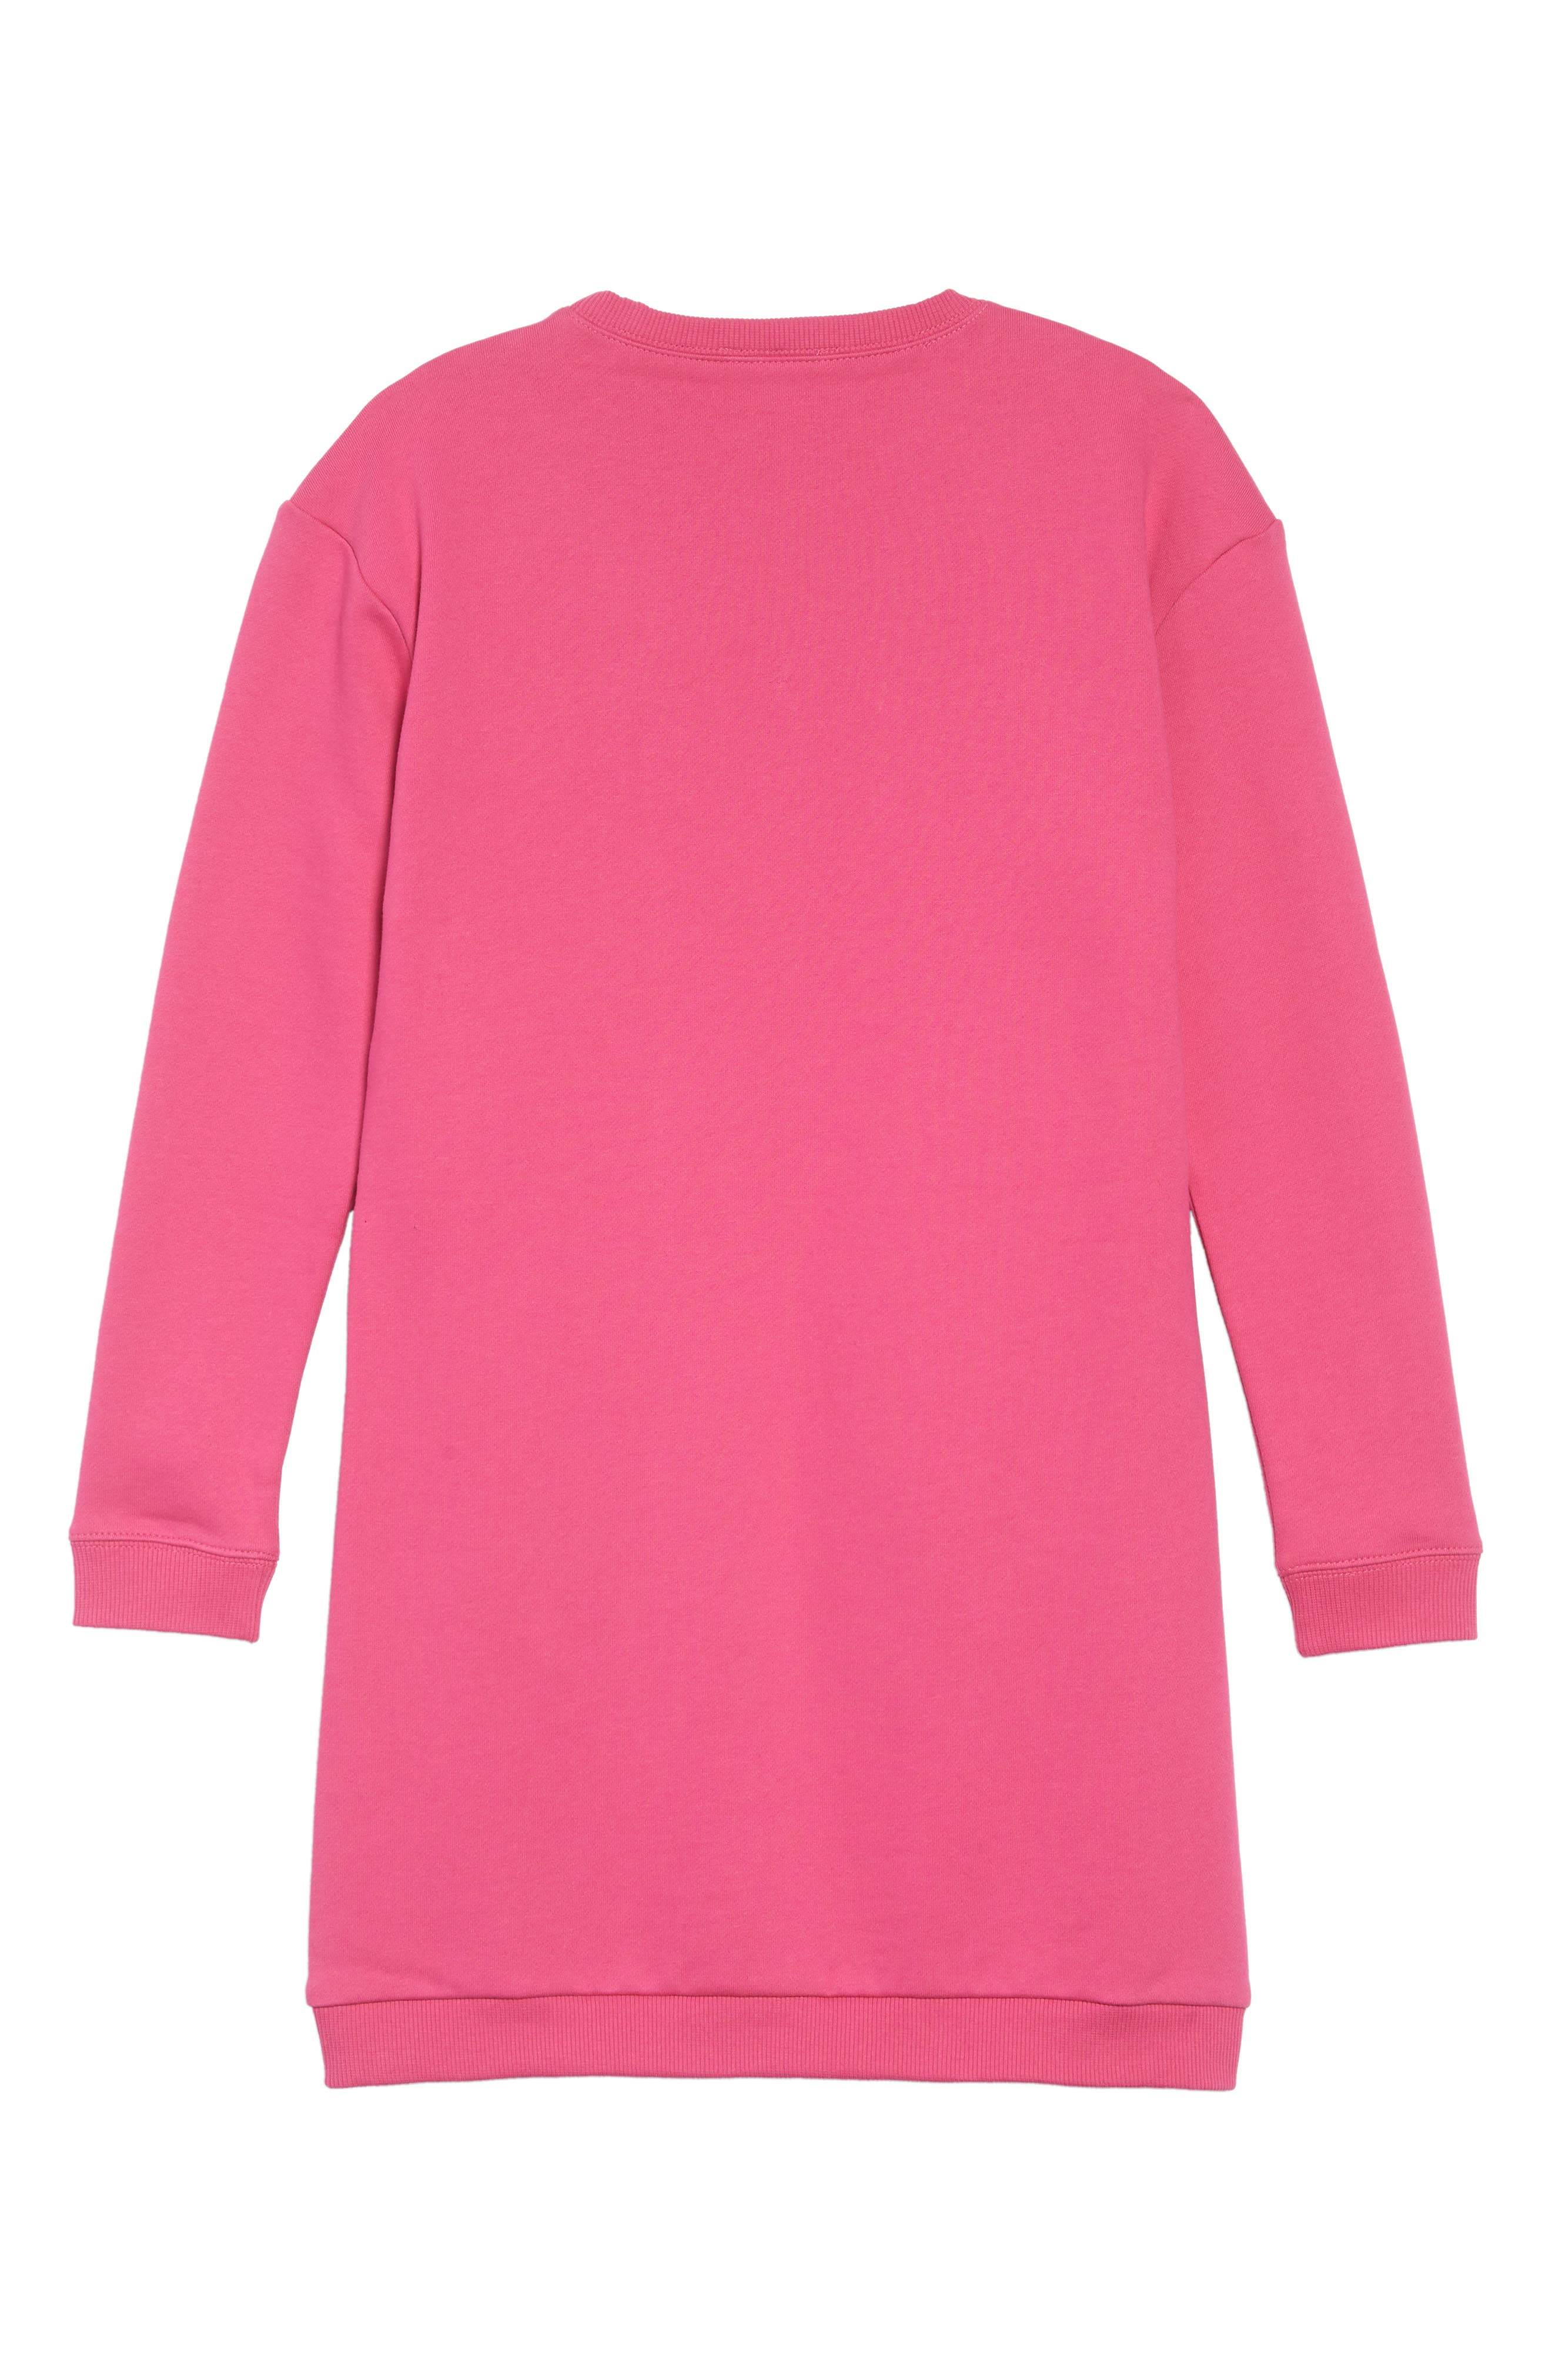 Miss Marc Sweatshirt Dress,                             Alternate thumbnail 2, color,                             670